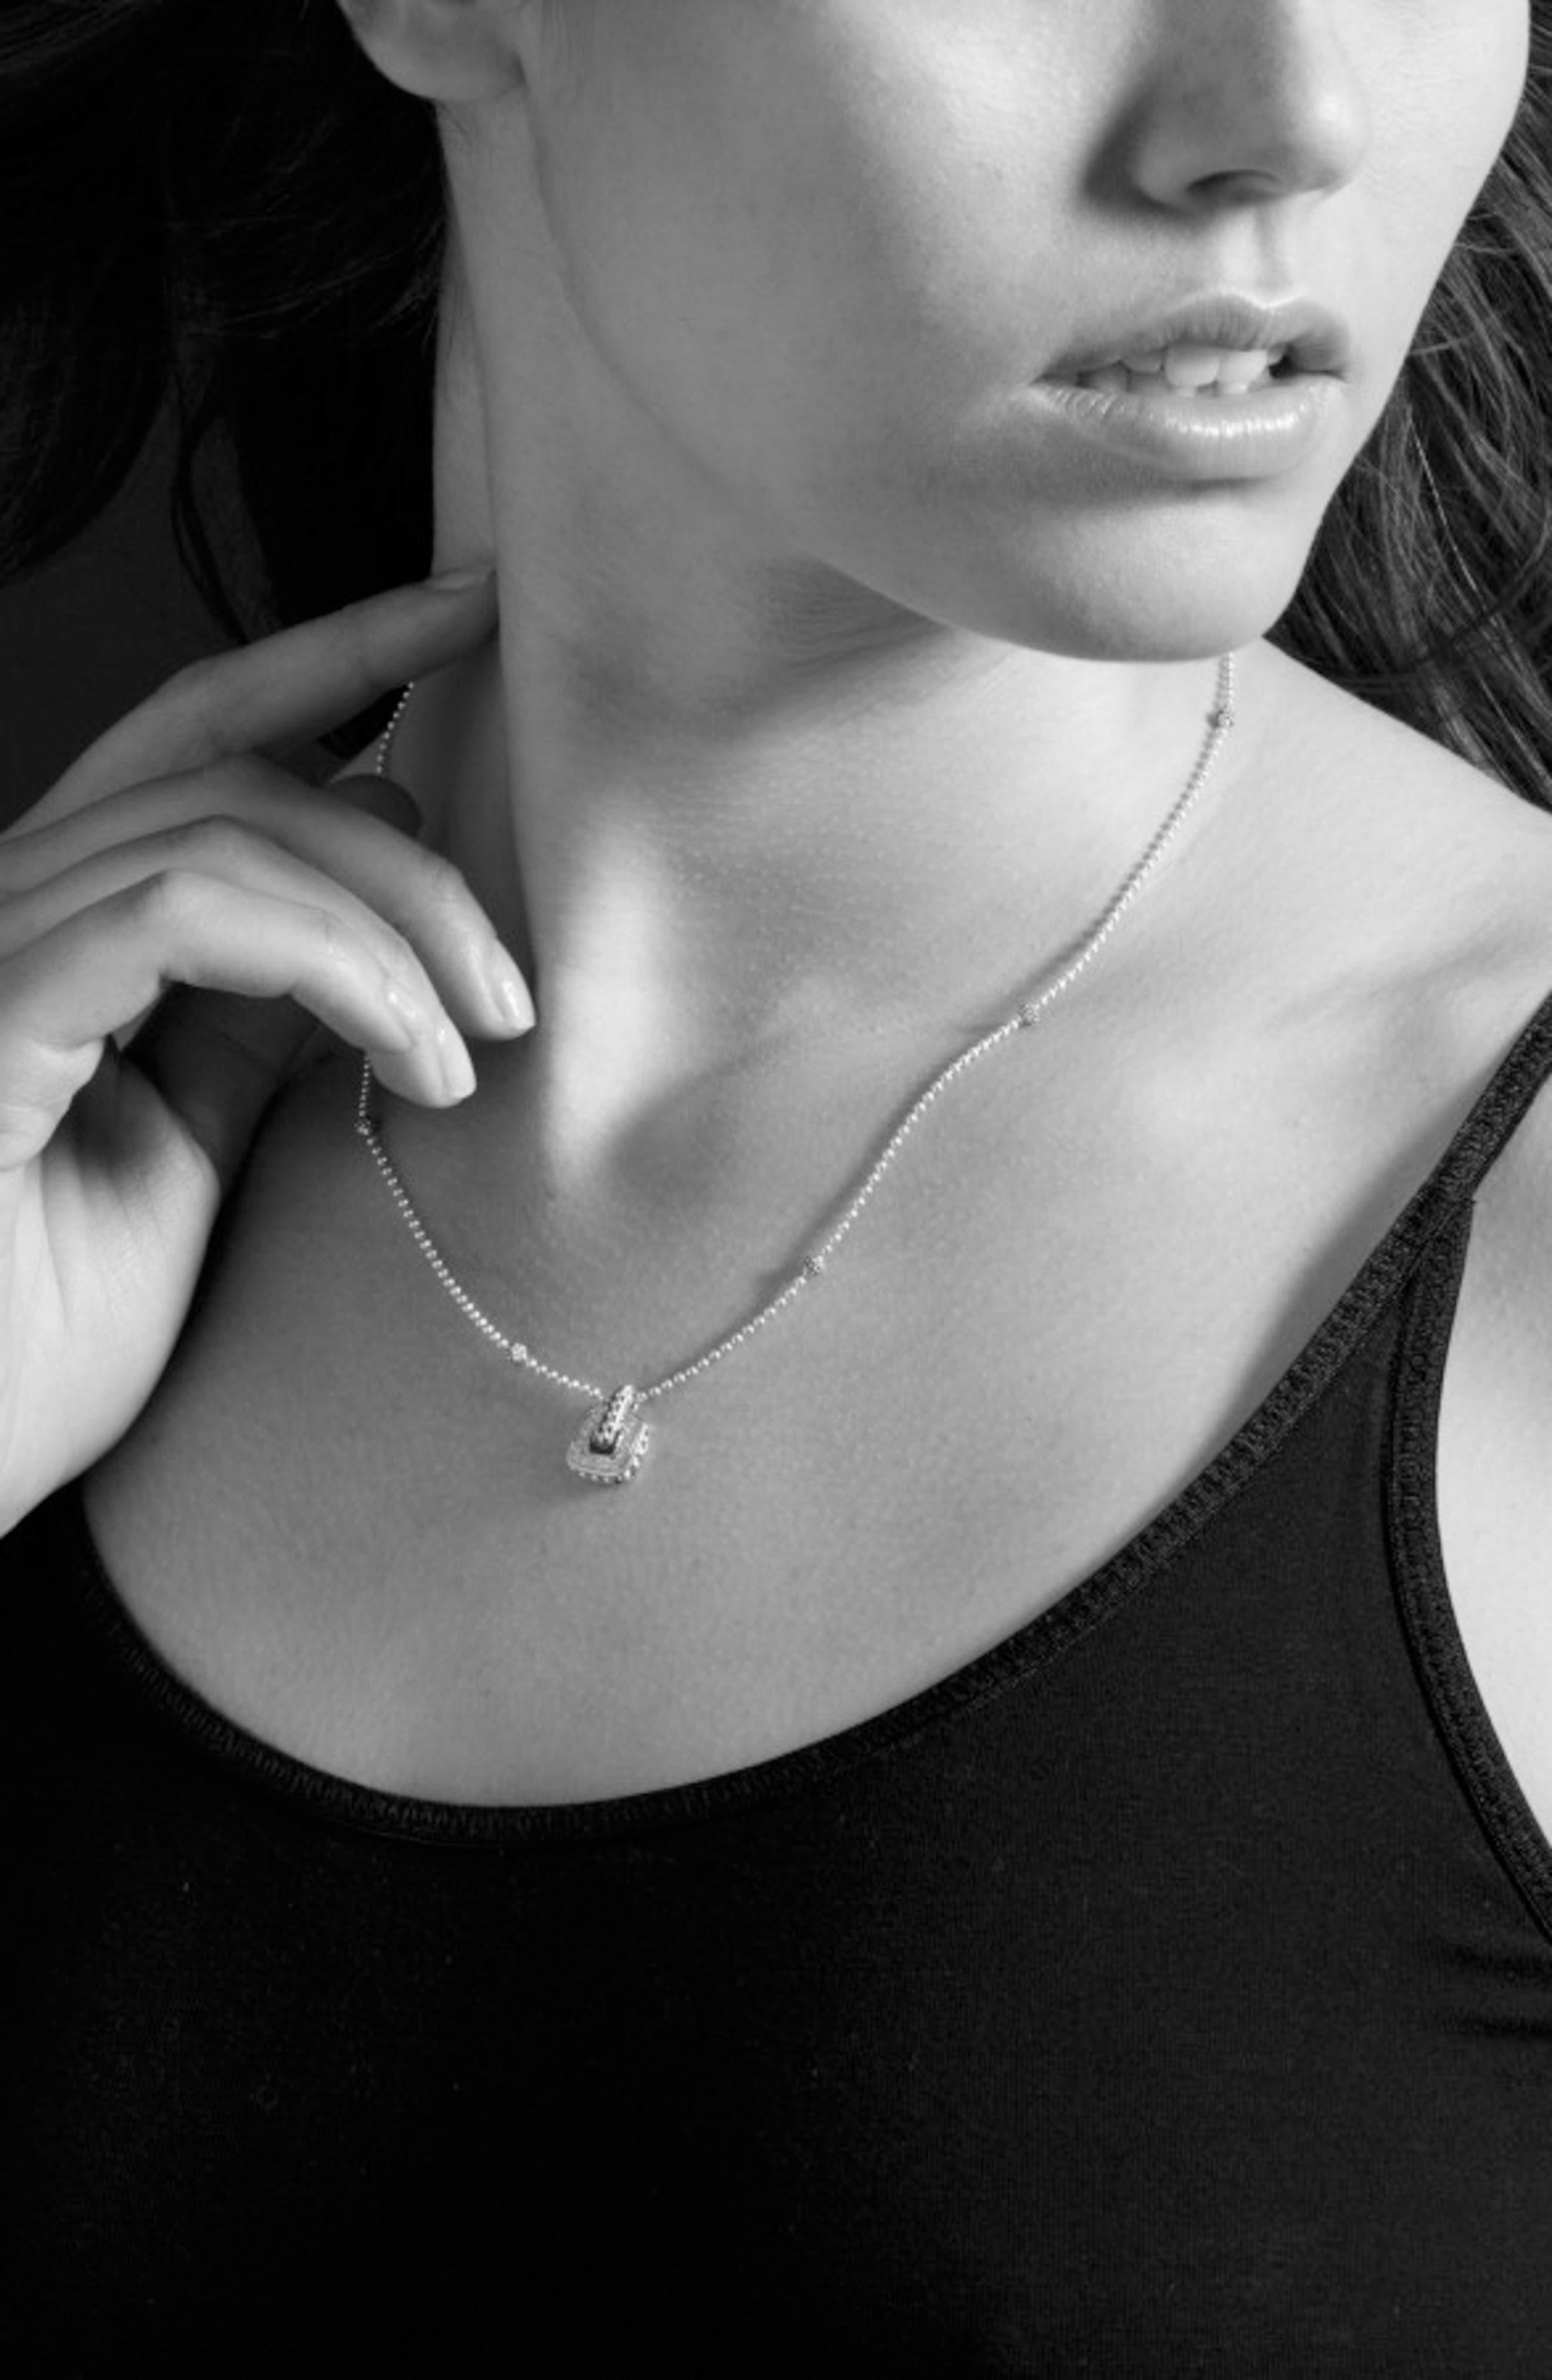 'Cushion' Small Pendant Necklace,                             Alternate thumbnail 2, color,                             040